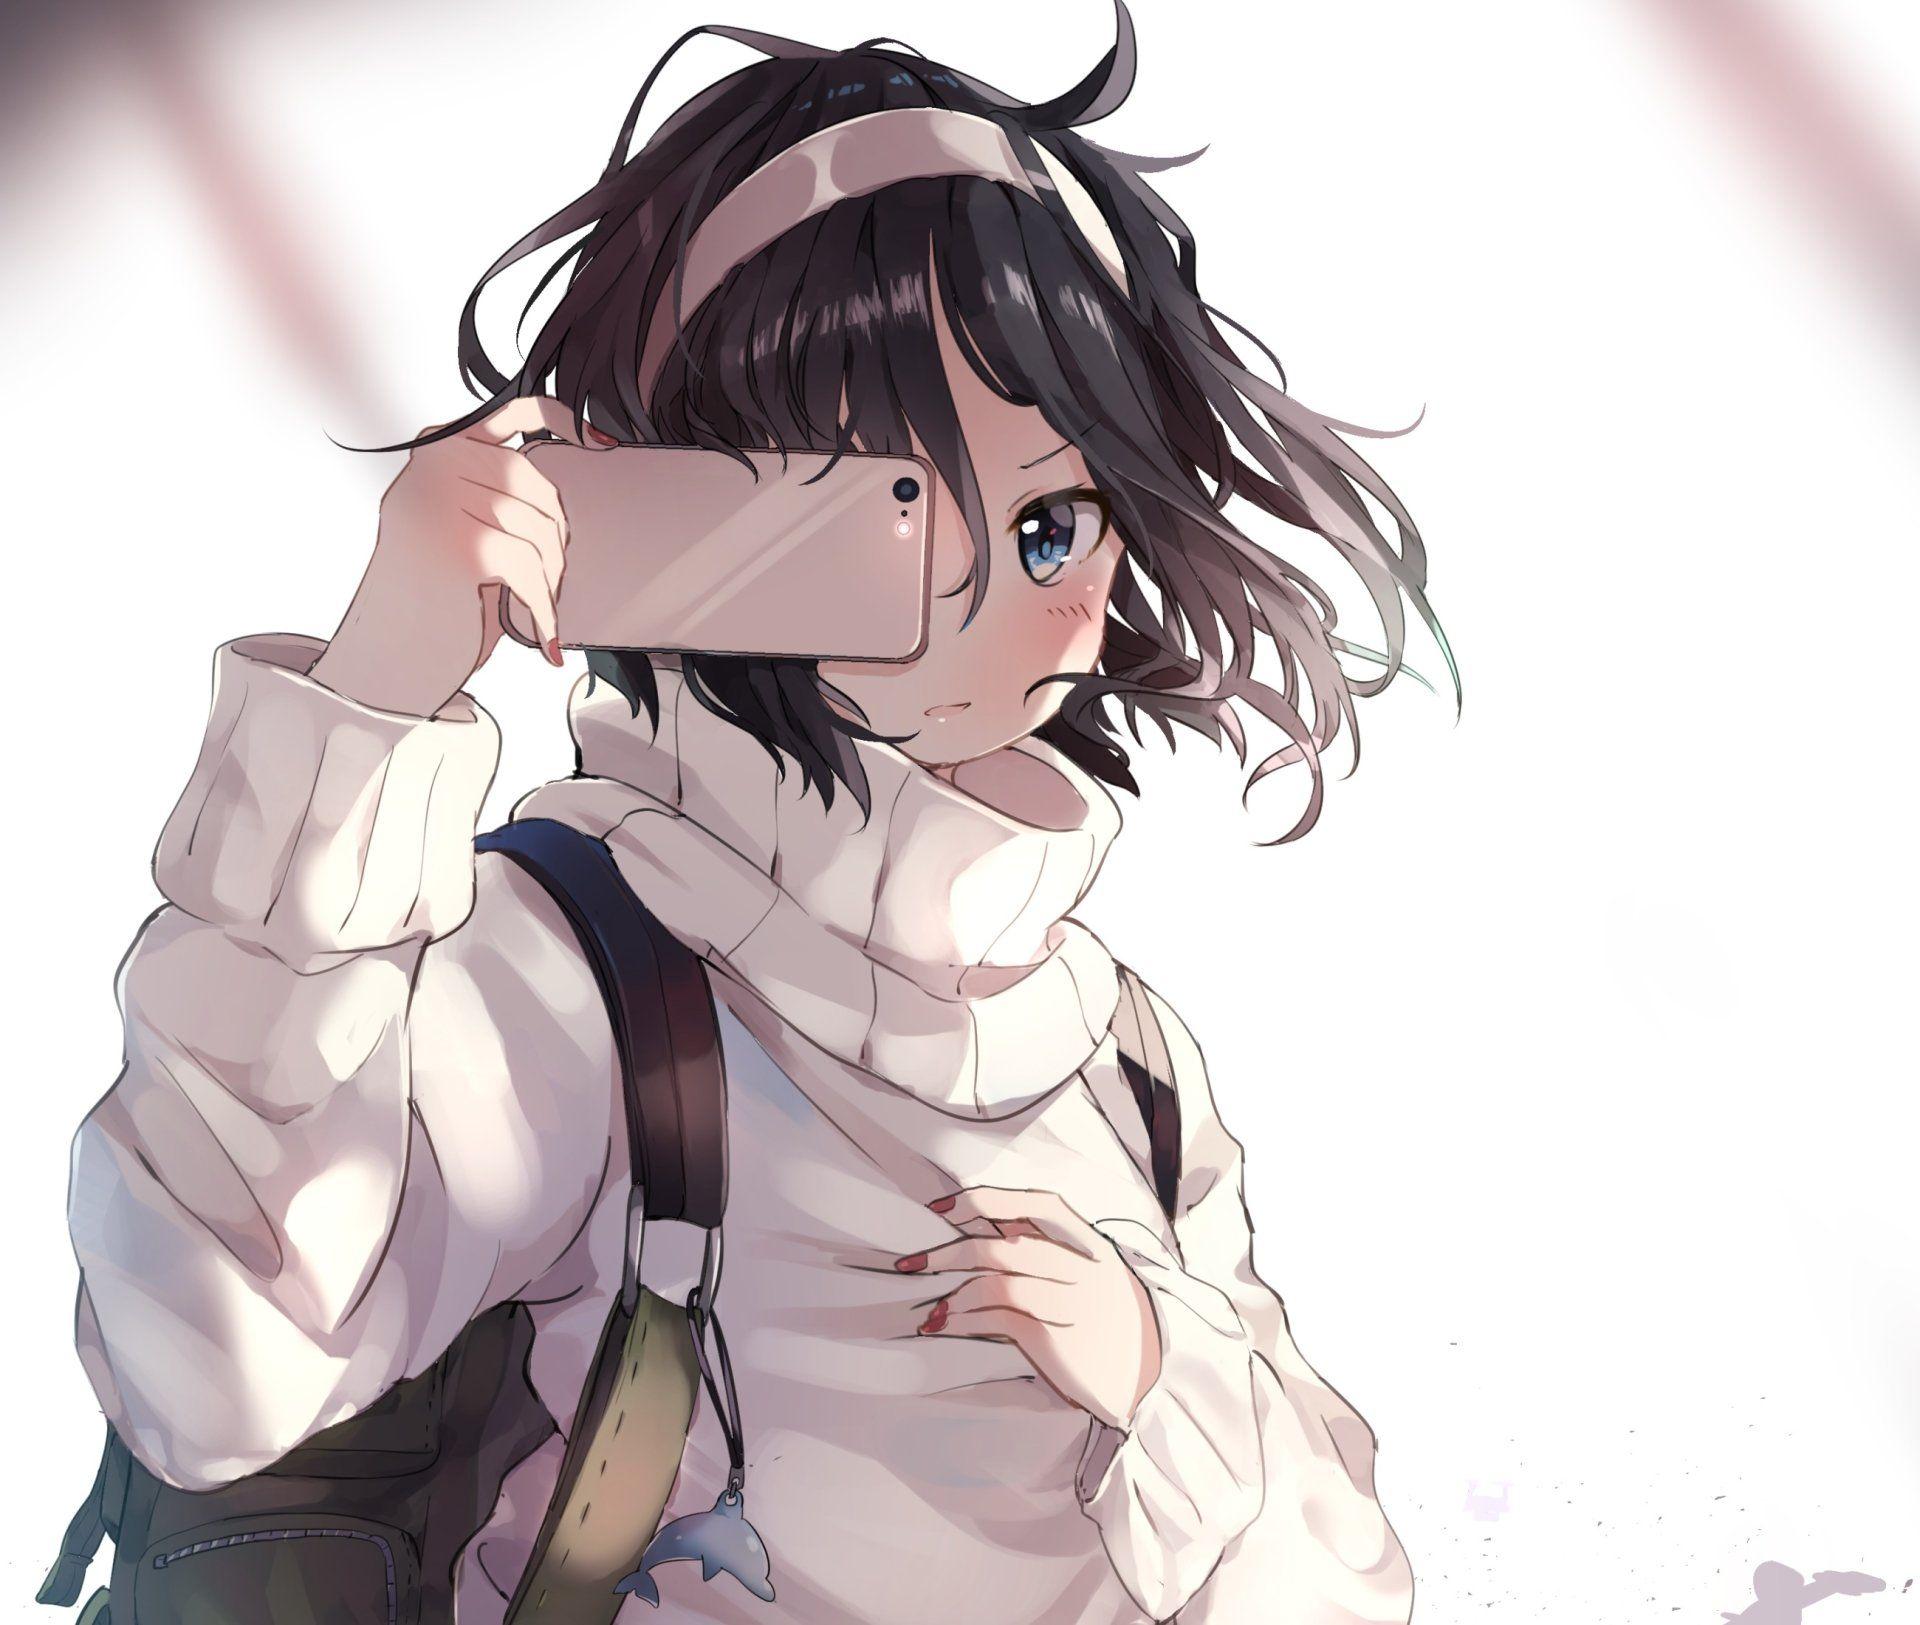 Anime Original Short Hair Black Hair Headband Smartphone